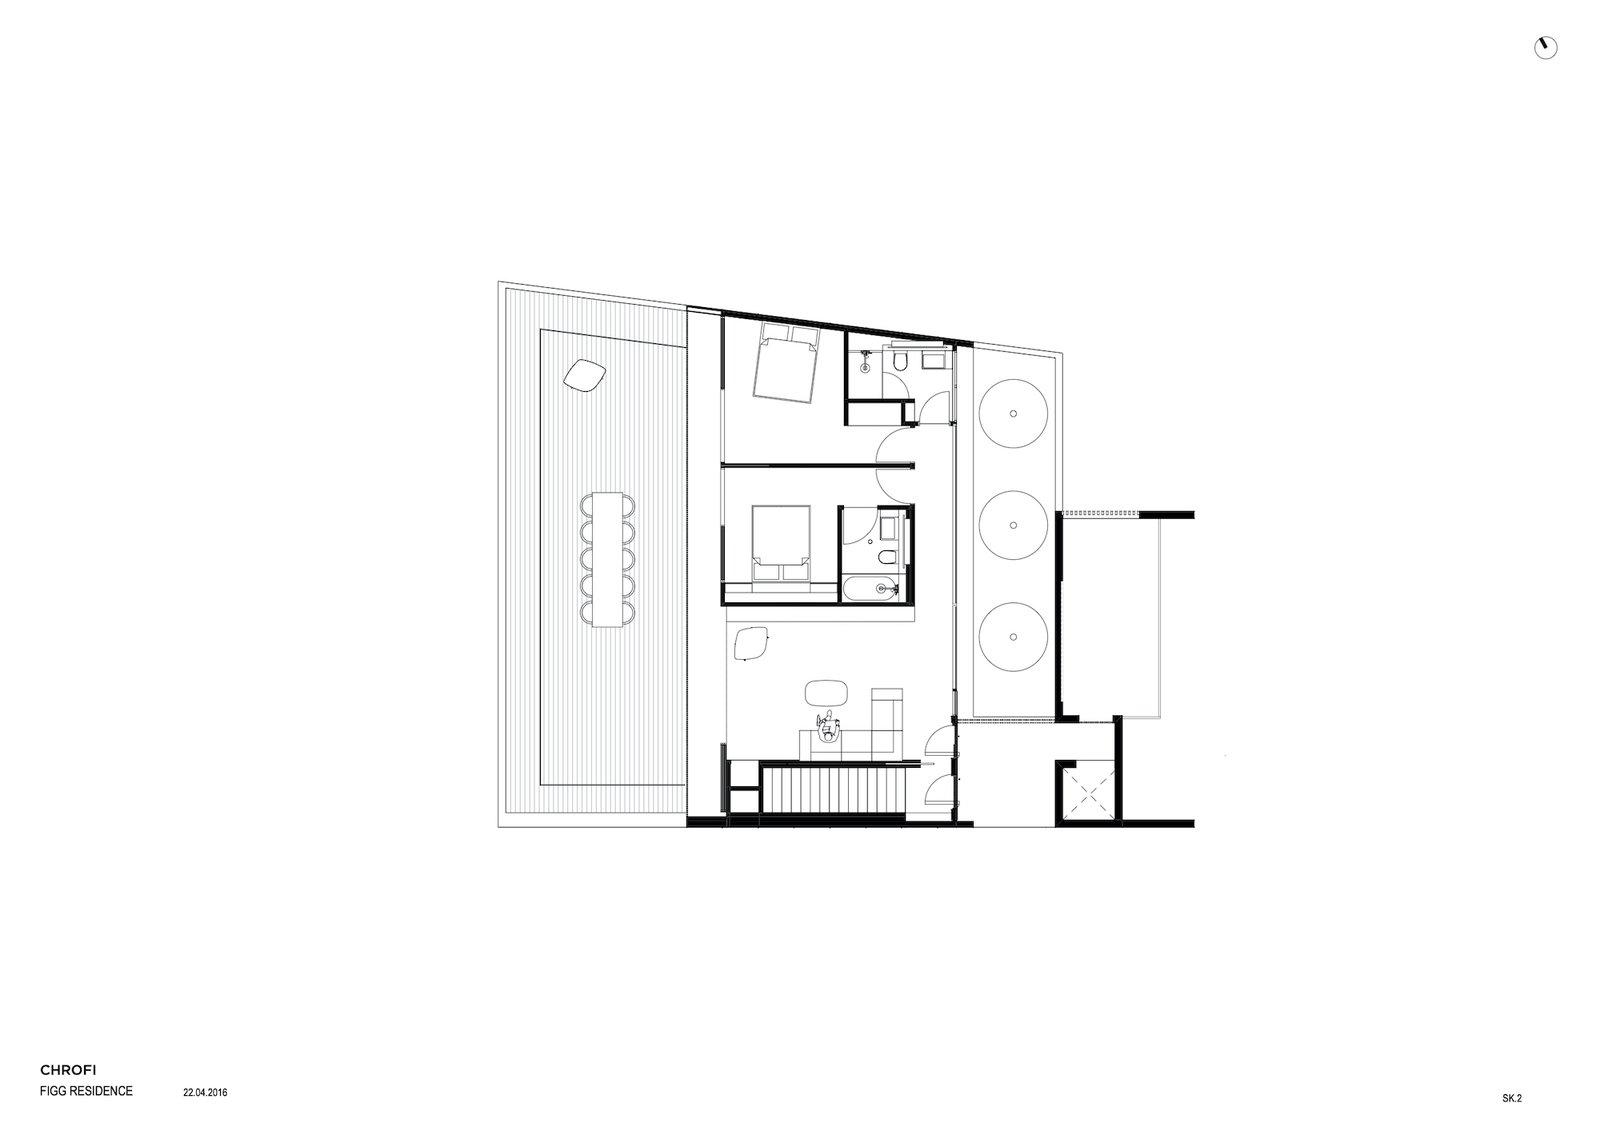 First-level floor plan of Church Point House by CHROFI.